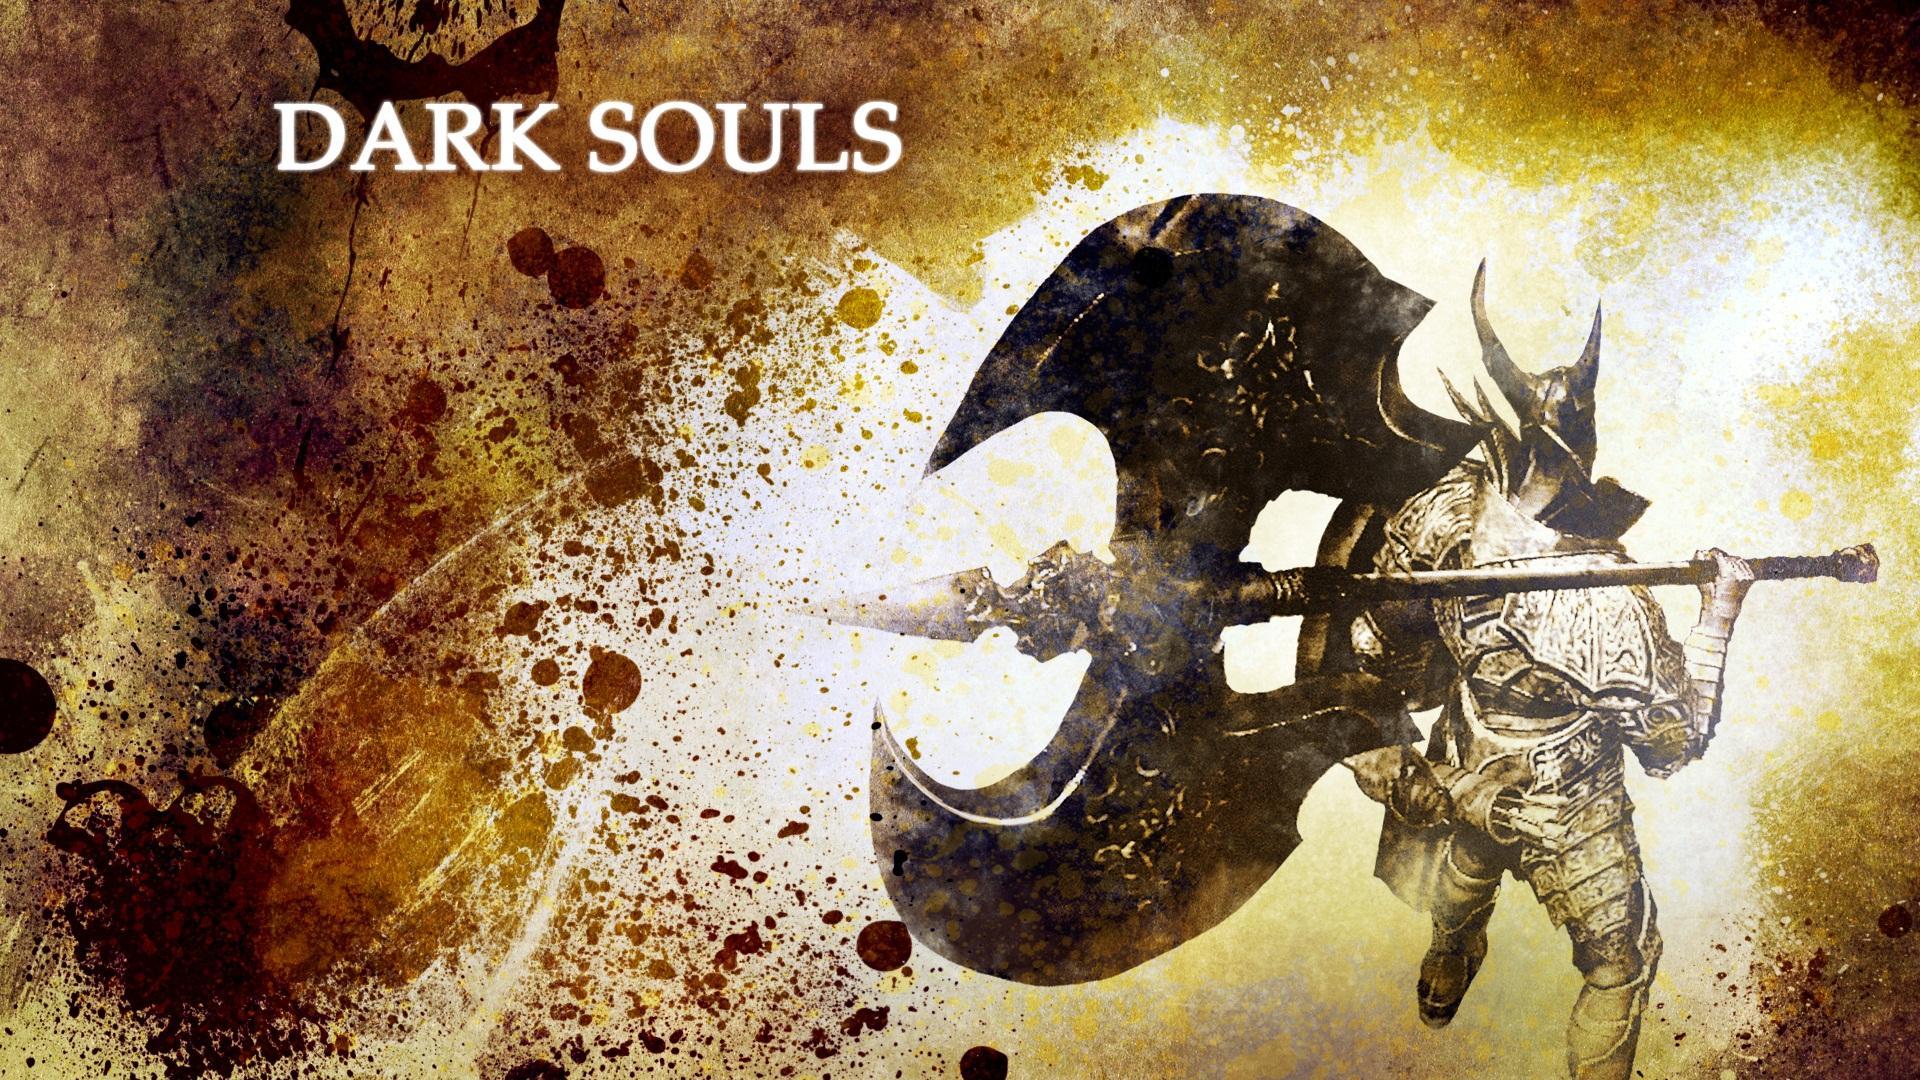 Dark Souls 2 Wallpaper Hd: Dark Souls Wallpapers, Pictures, Images